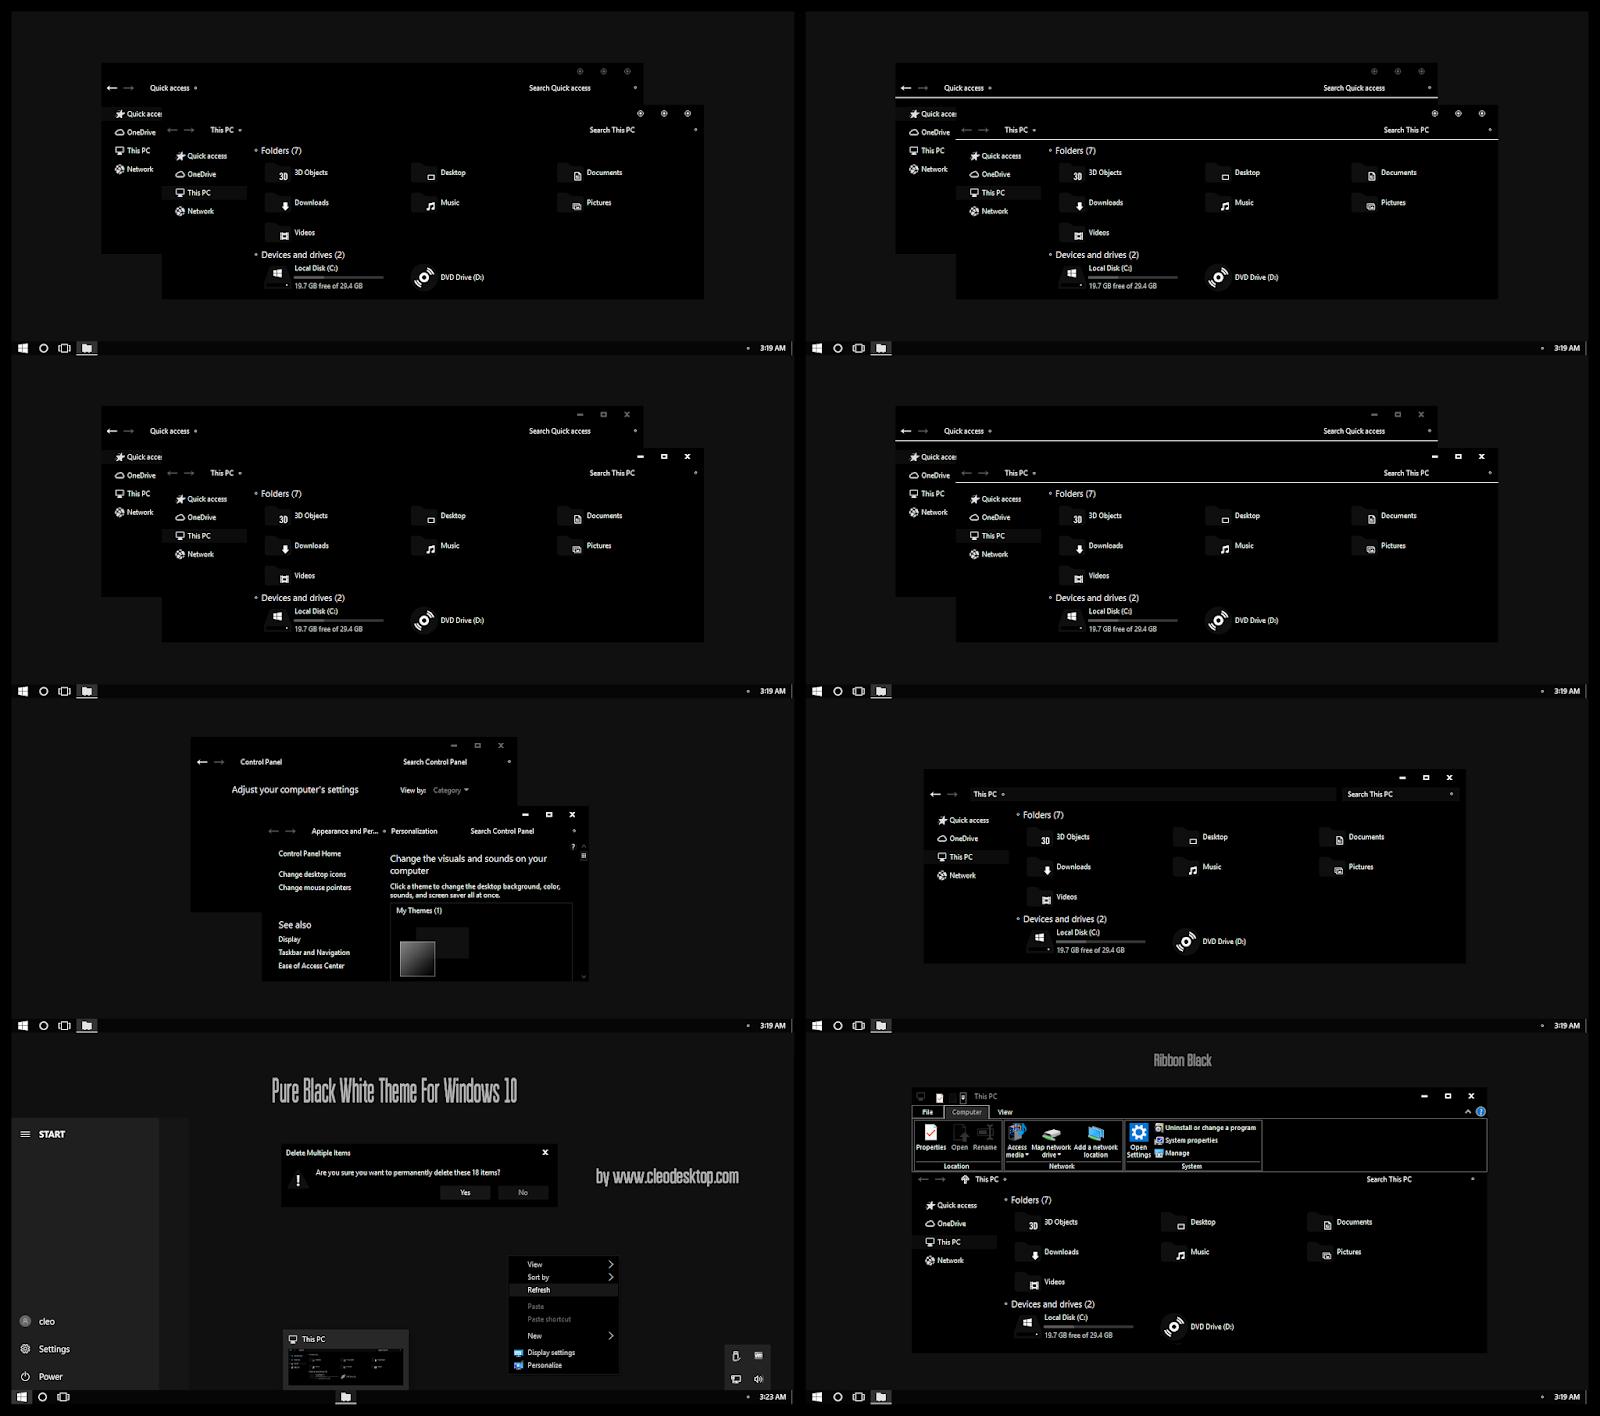 Pure Black White Theme Windows10 May 2019 Update 1903